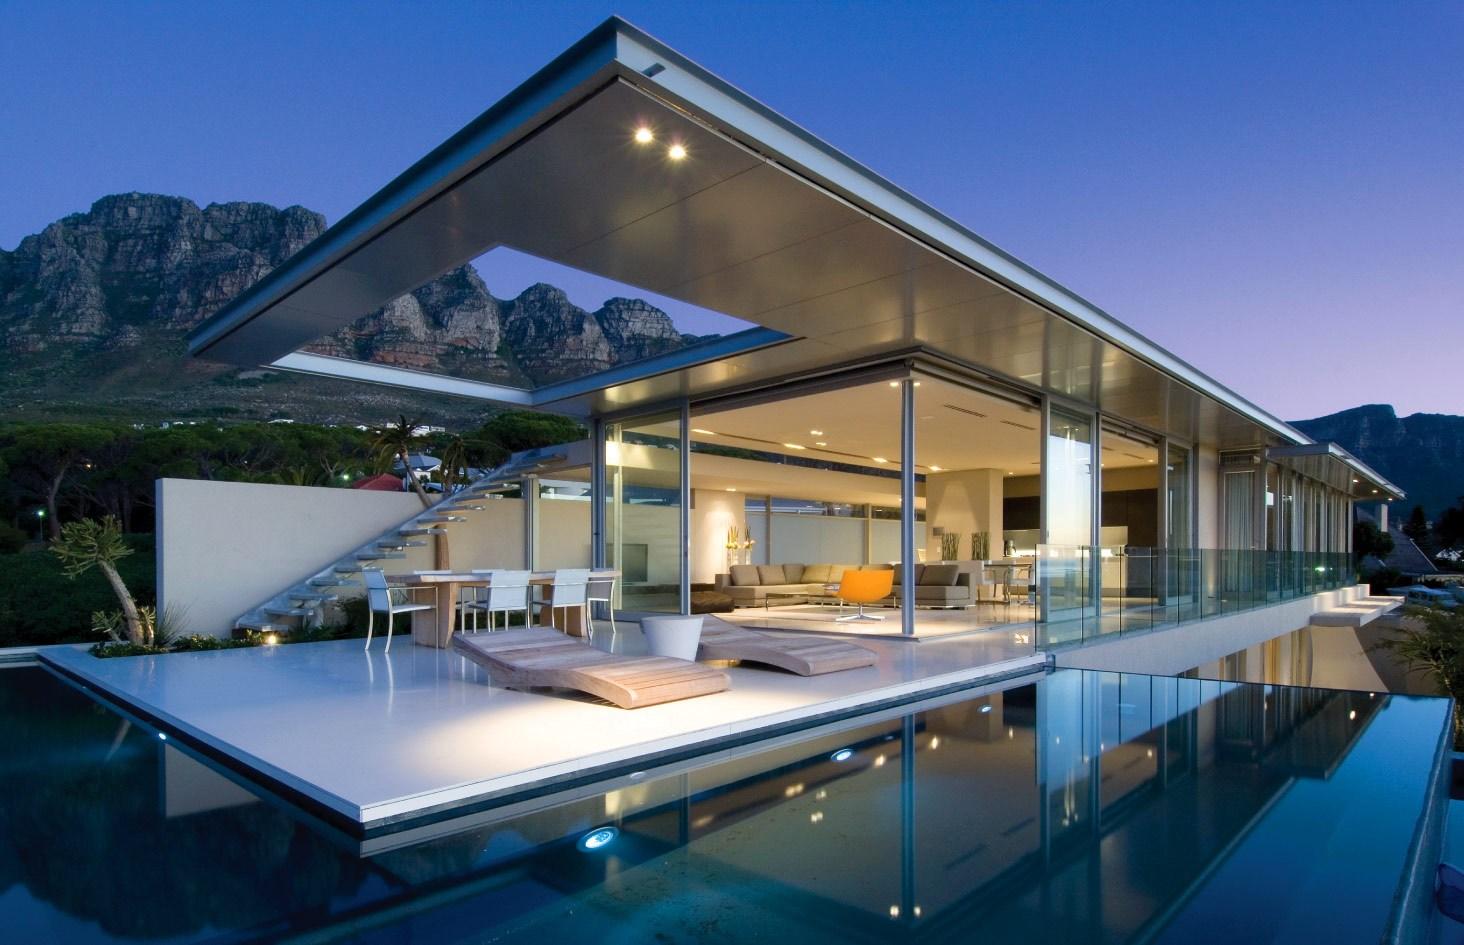 modern-home-design-beautiful-ideas-8-on-home-design-ideas